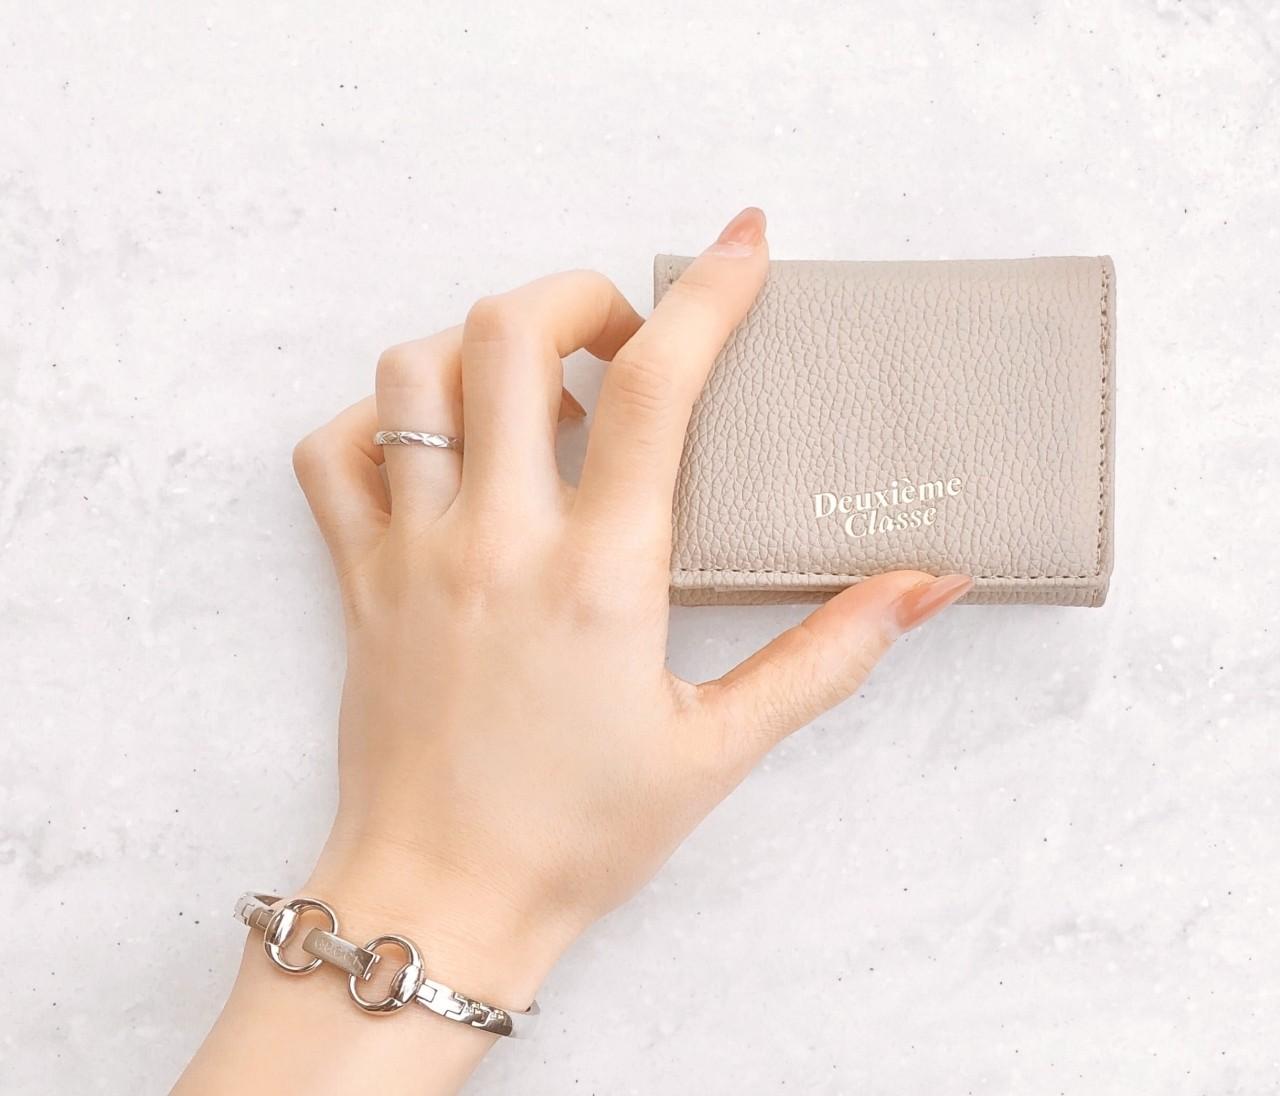 【BAILA 4月号付録】大人気ブランドコラボのミニ財布